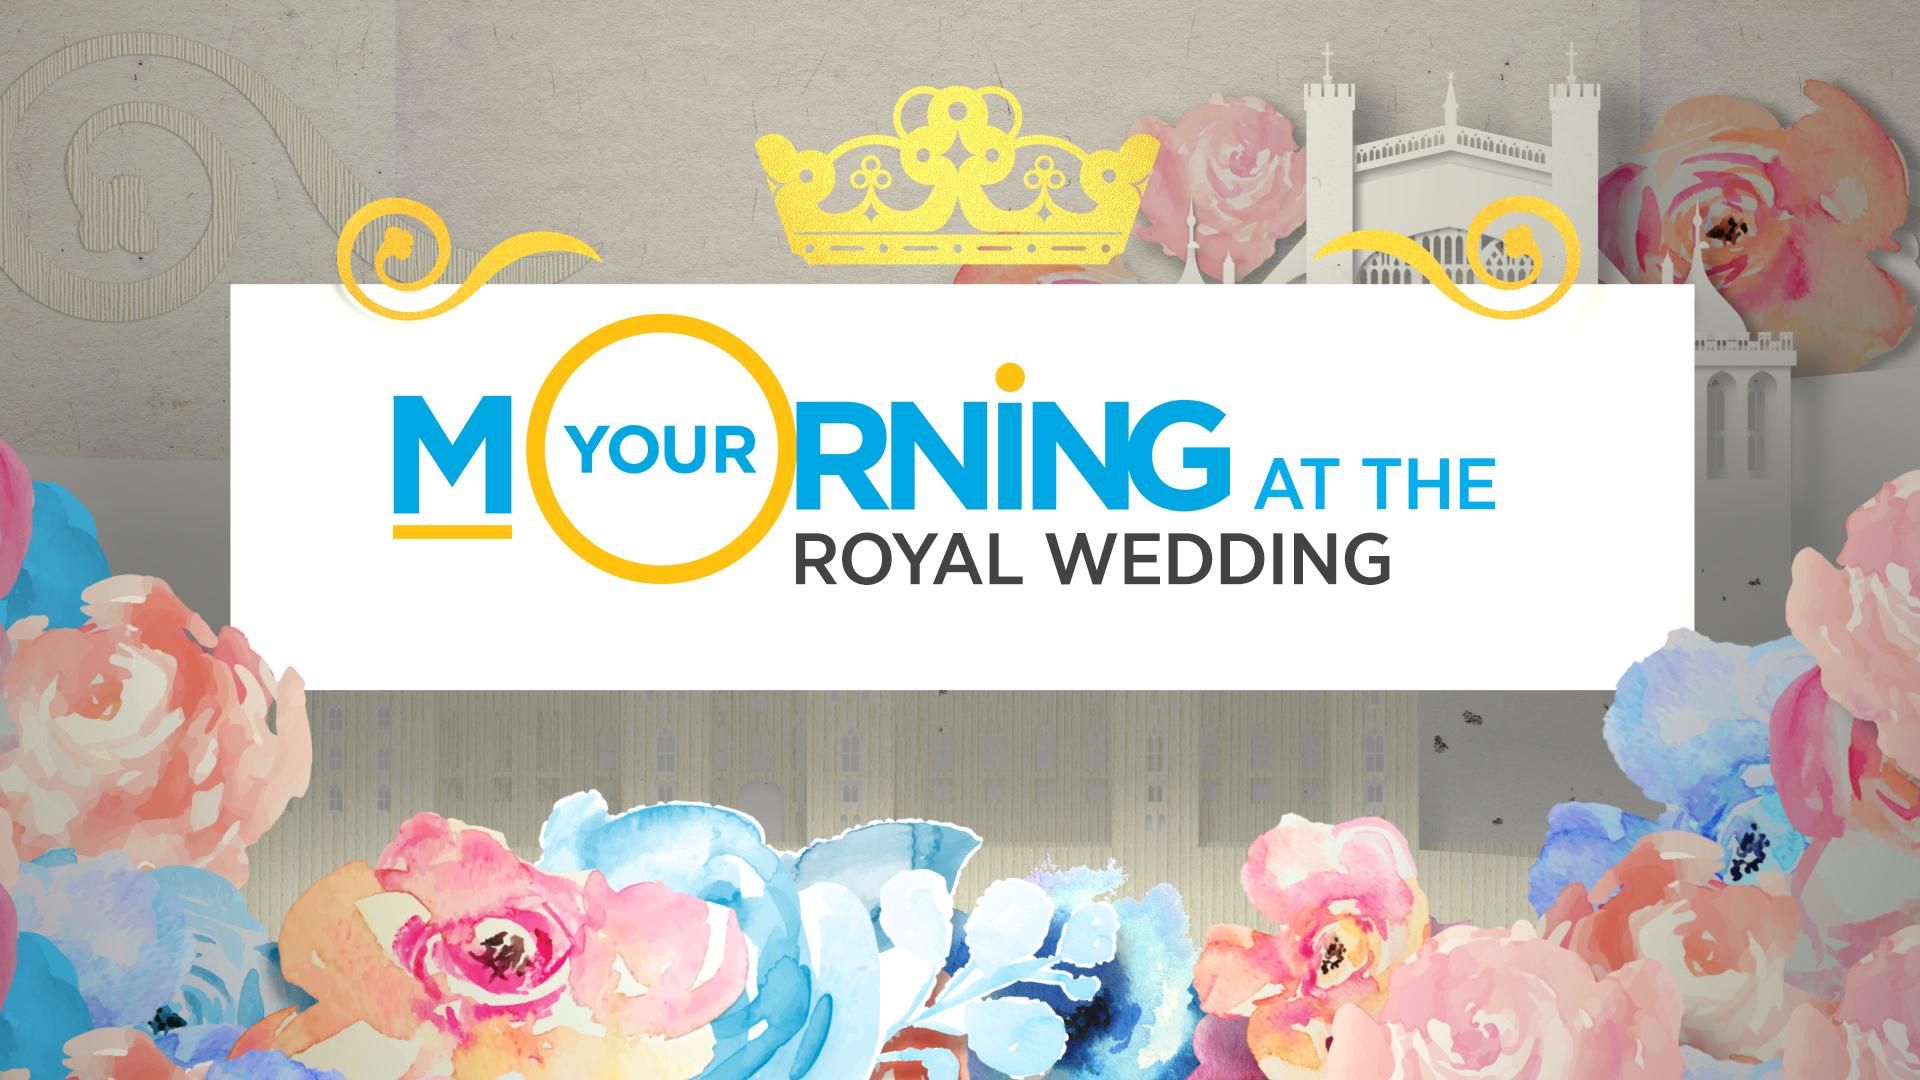 Royal wedding: Media prepares for enormous TV audience